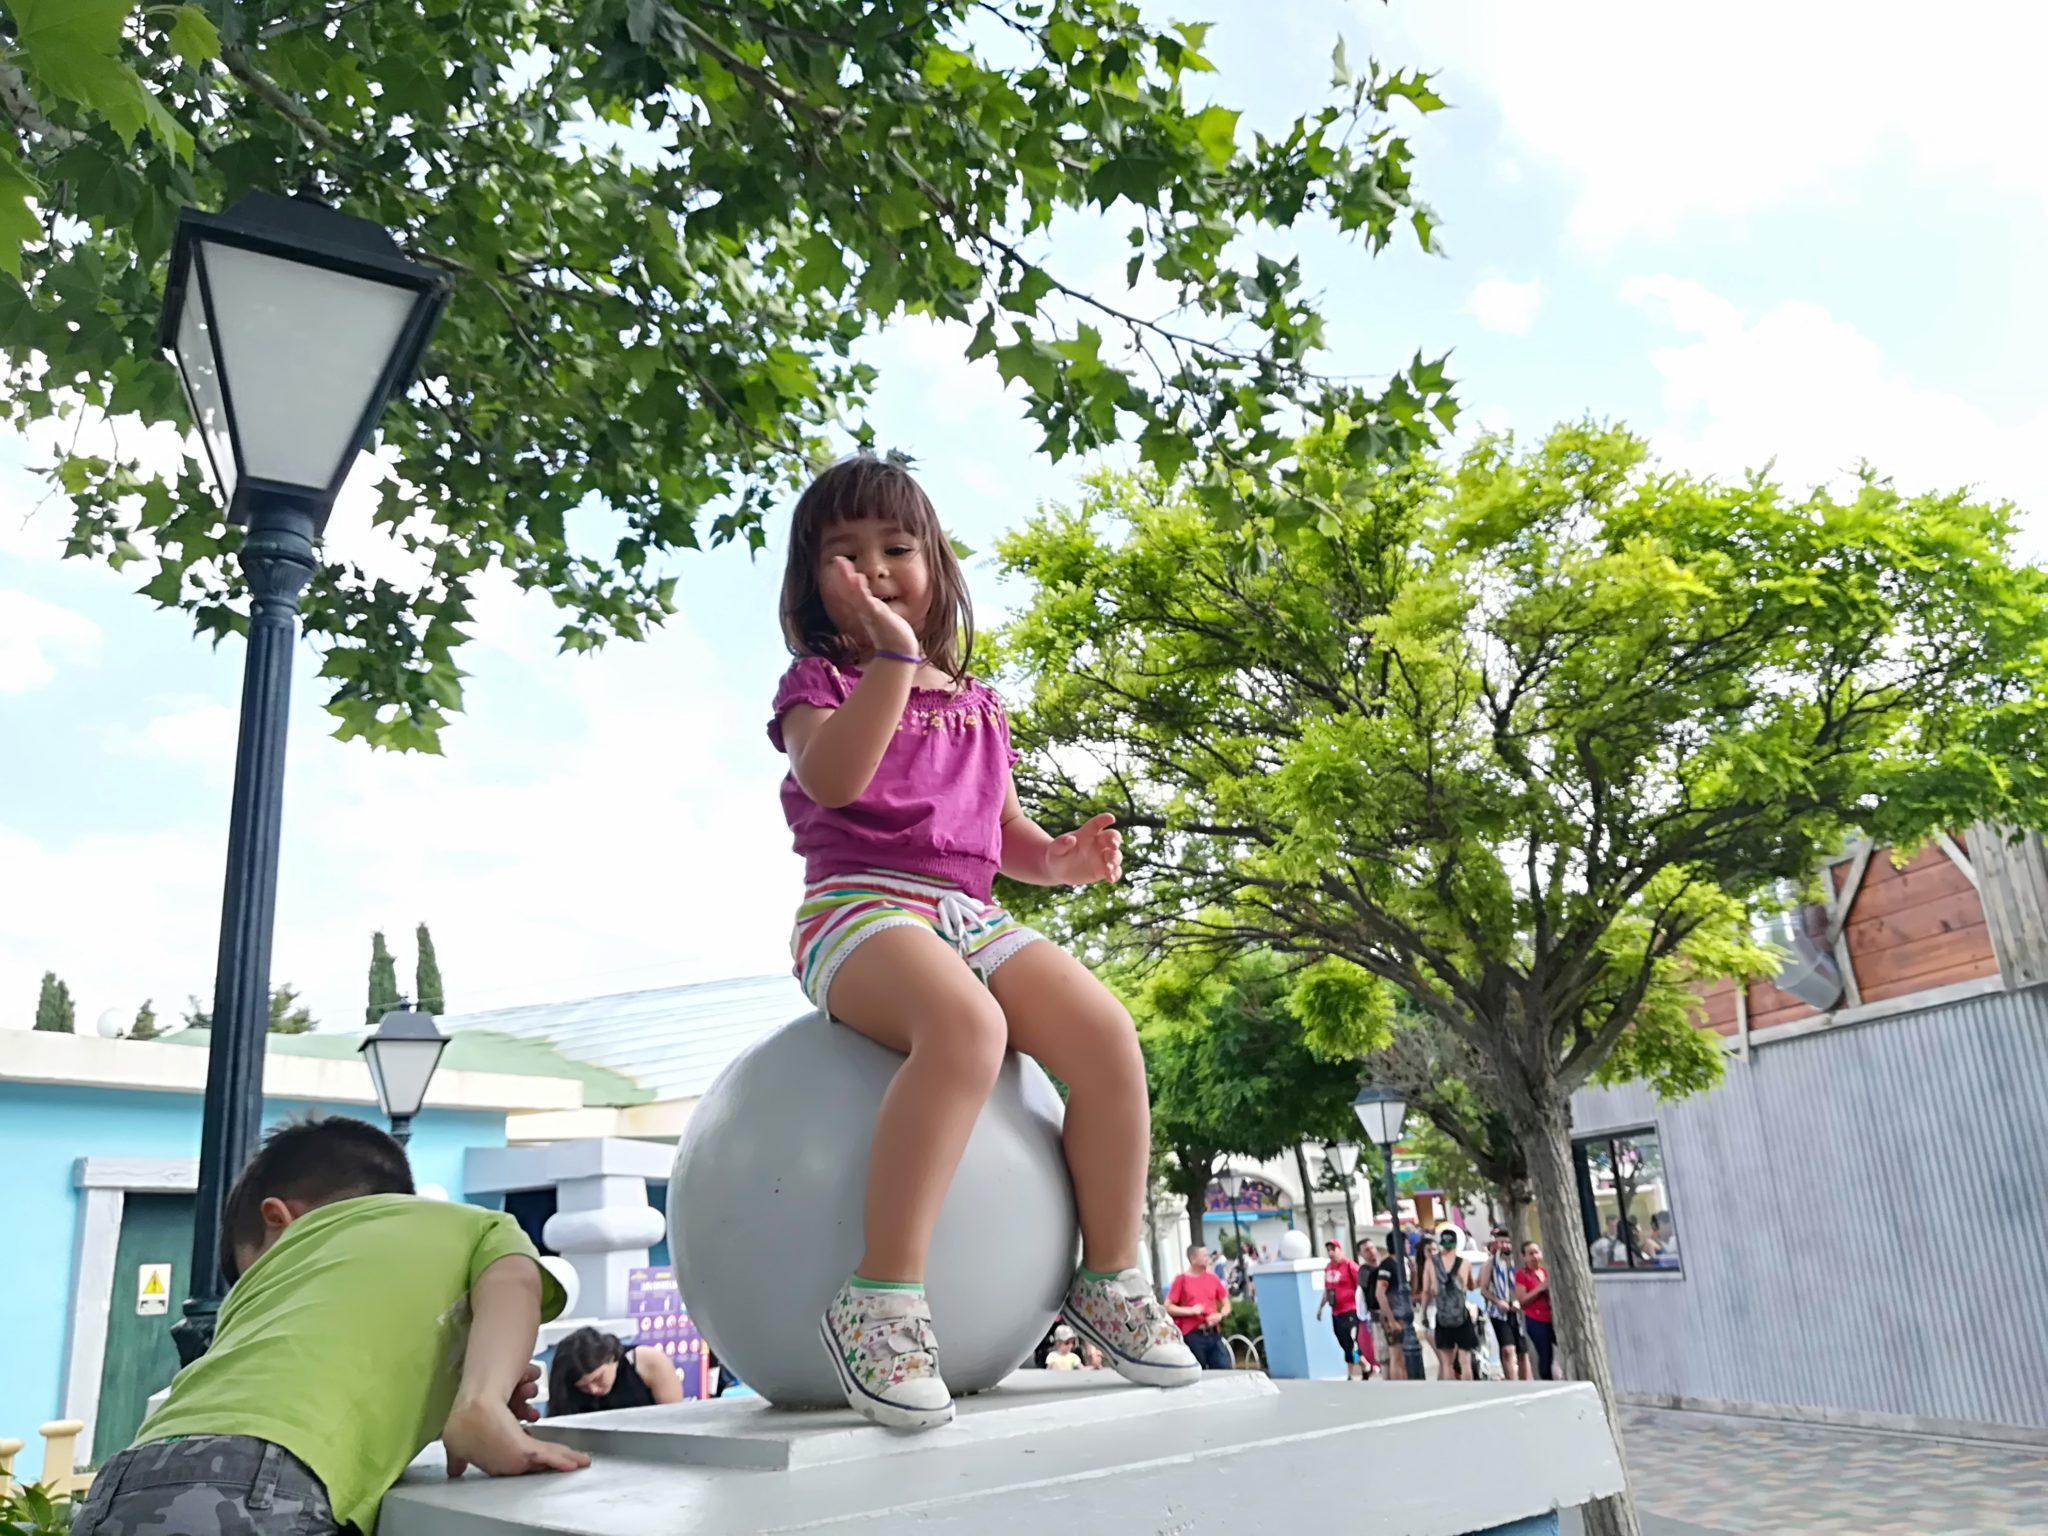 IMG 20180630 181422 - Visita Parque Warner en Madrid